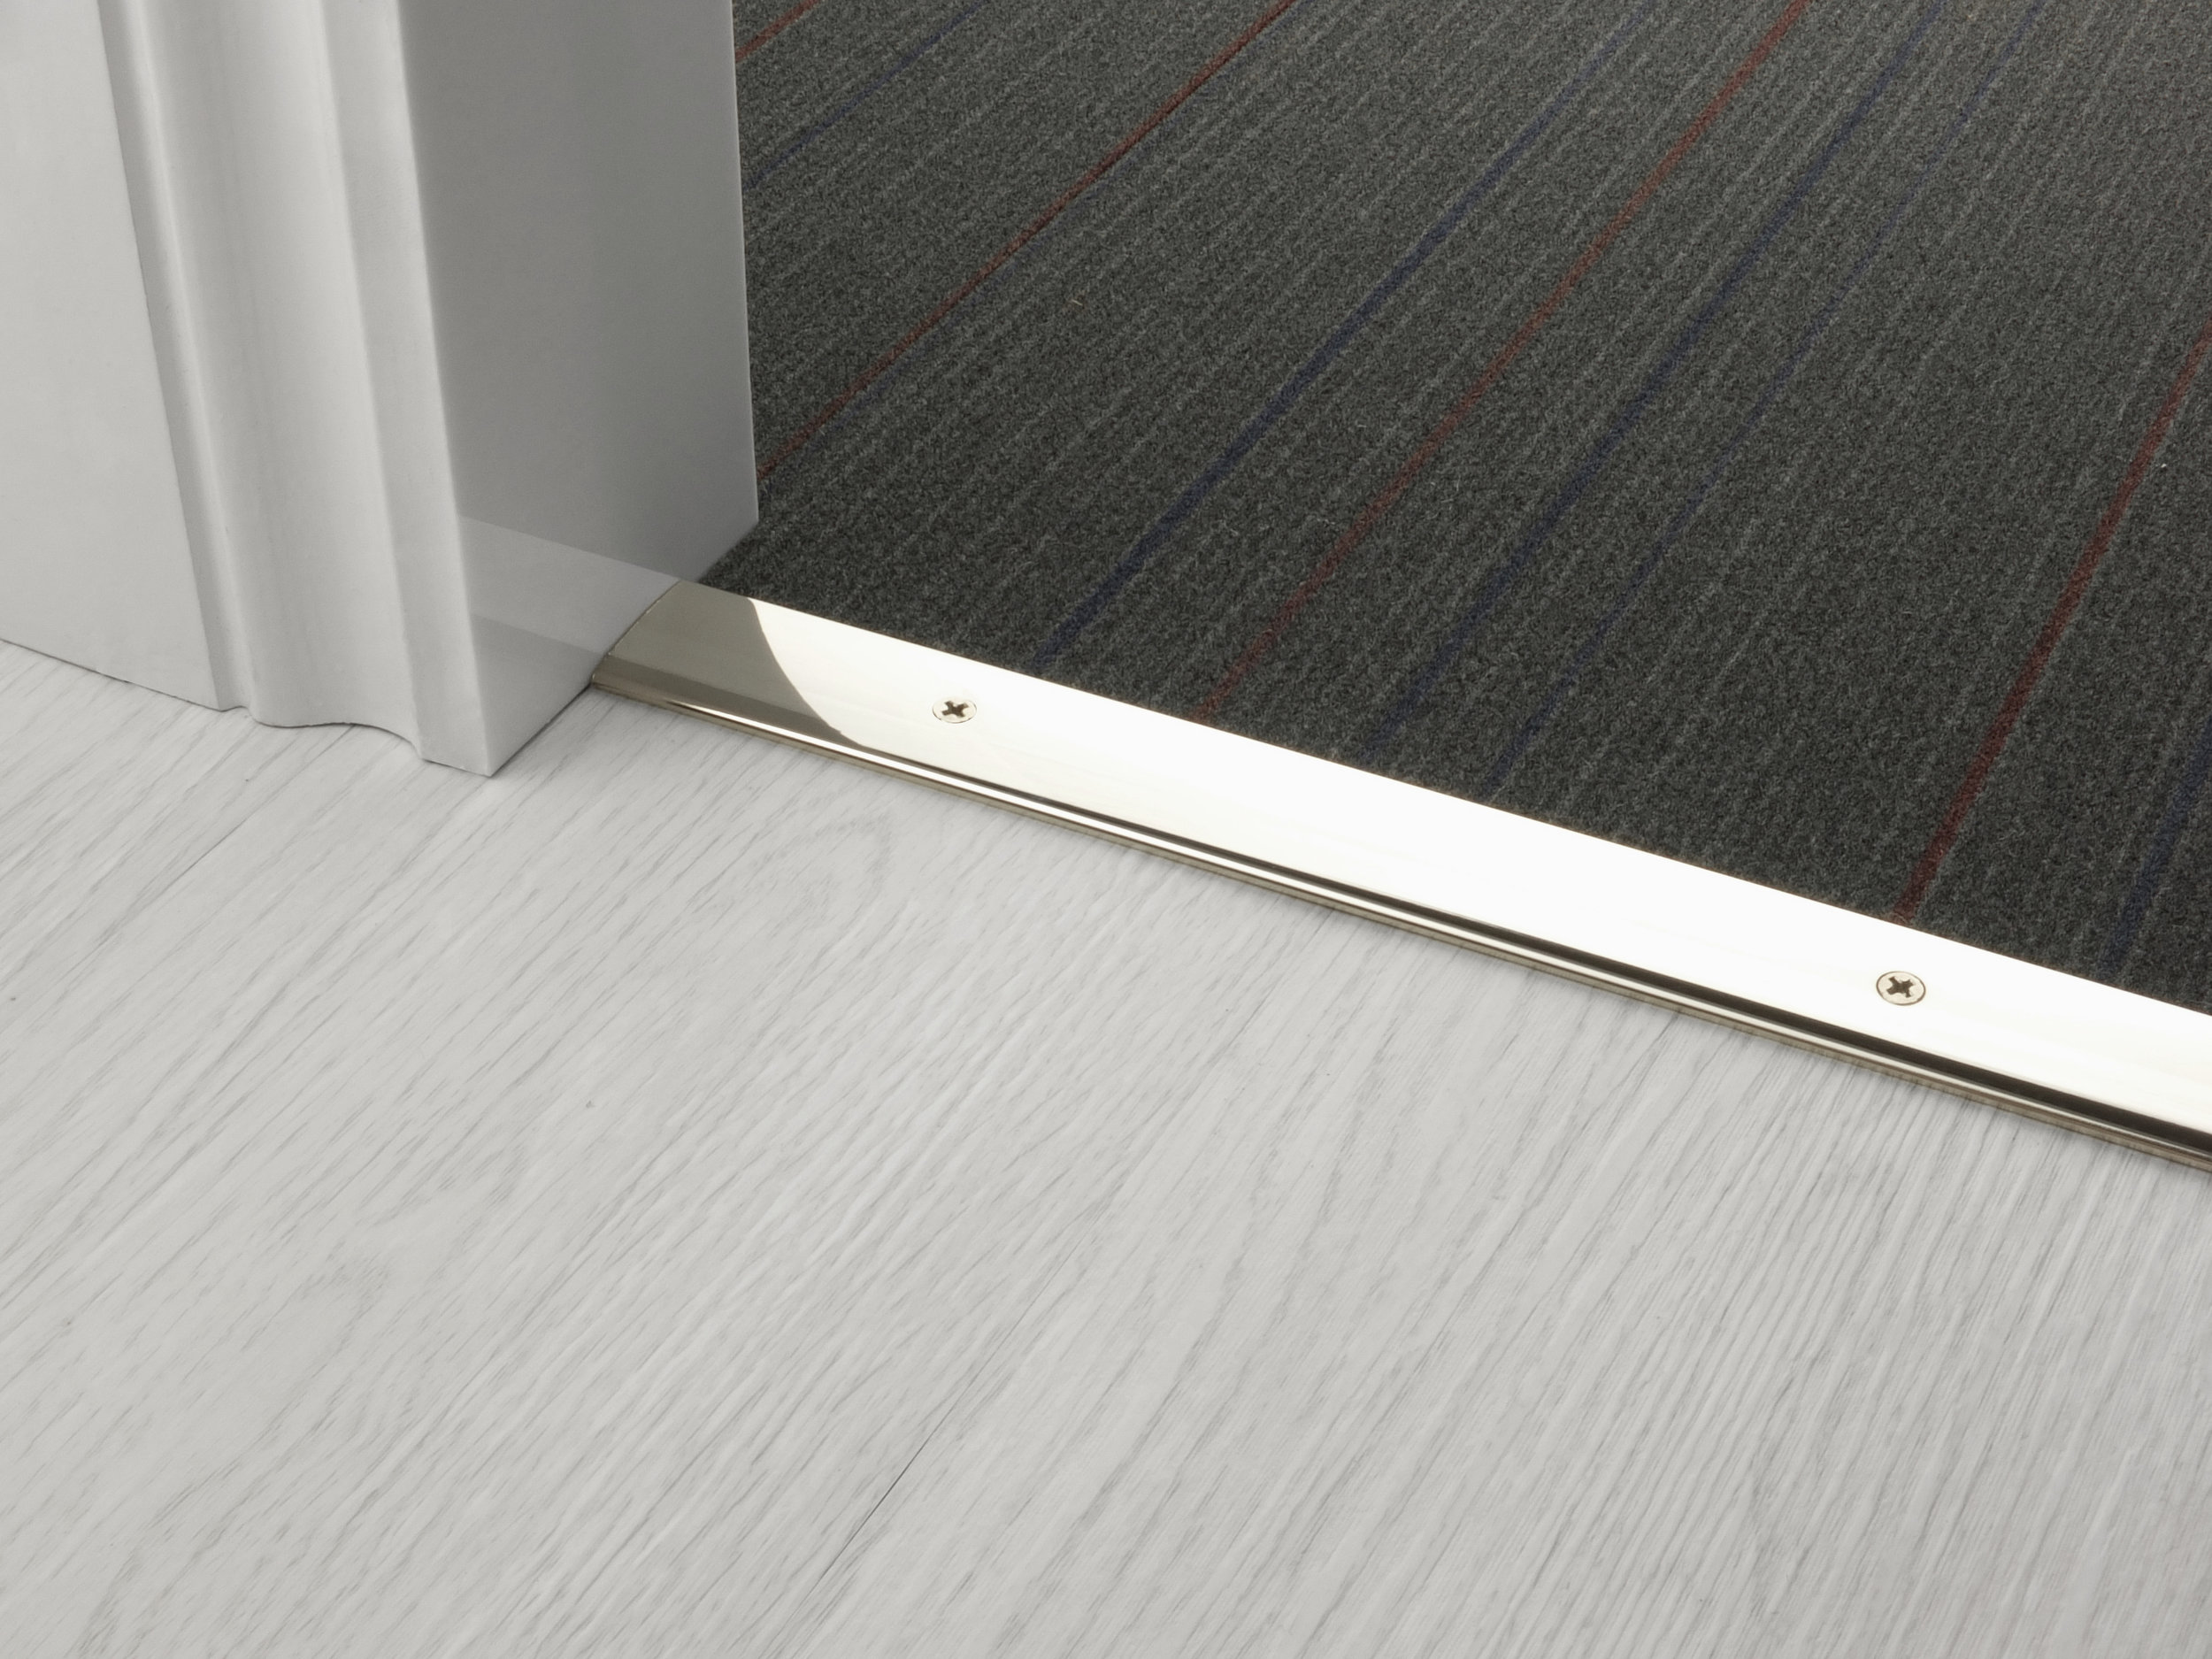 door_bar_cover-30mm_c2h_polished_nickel.jpg